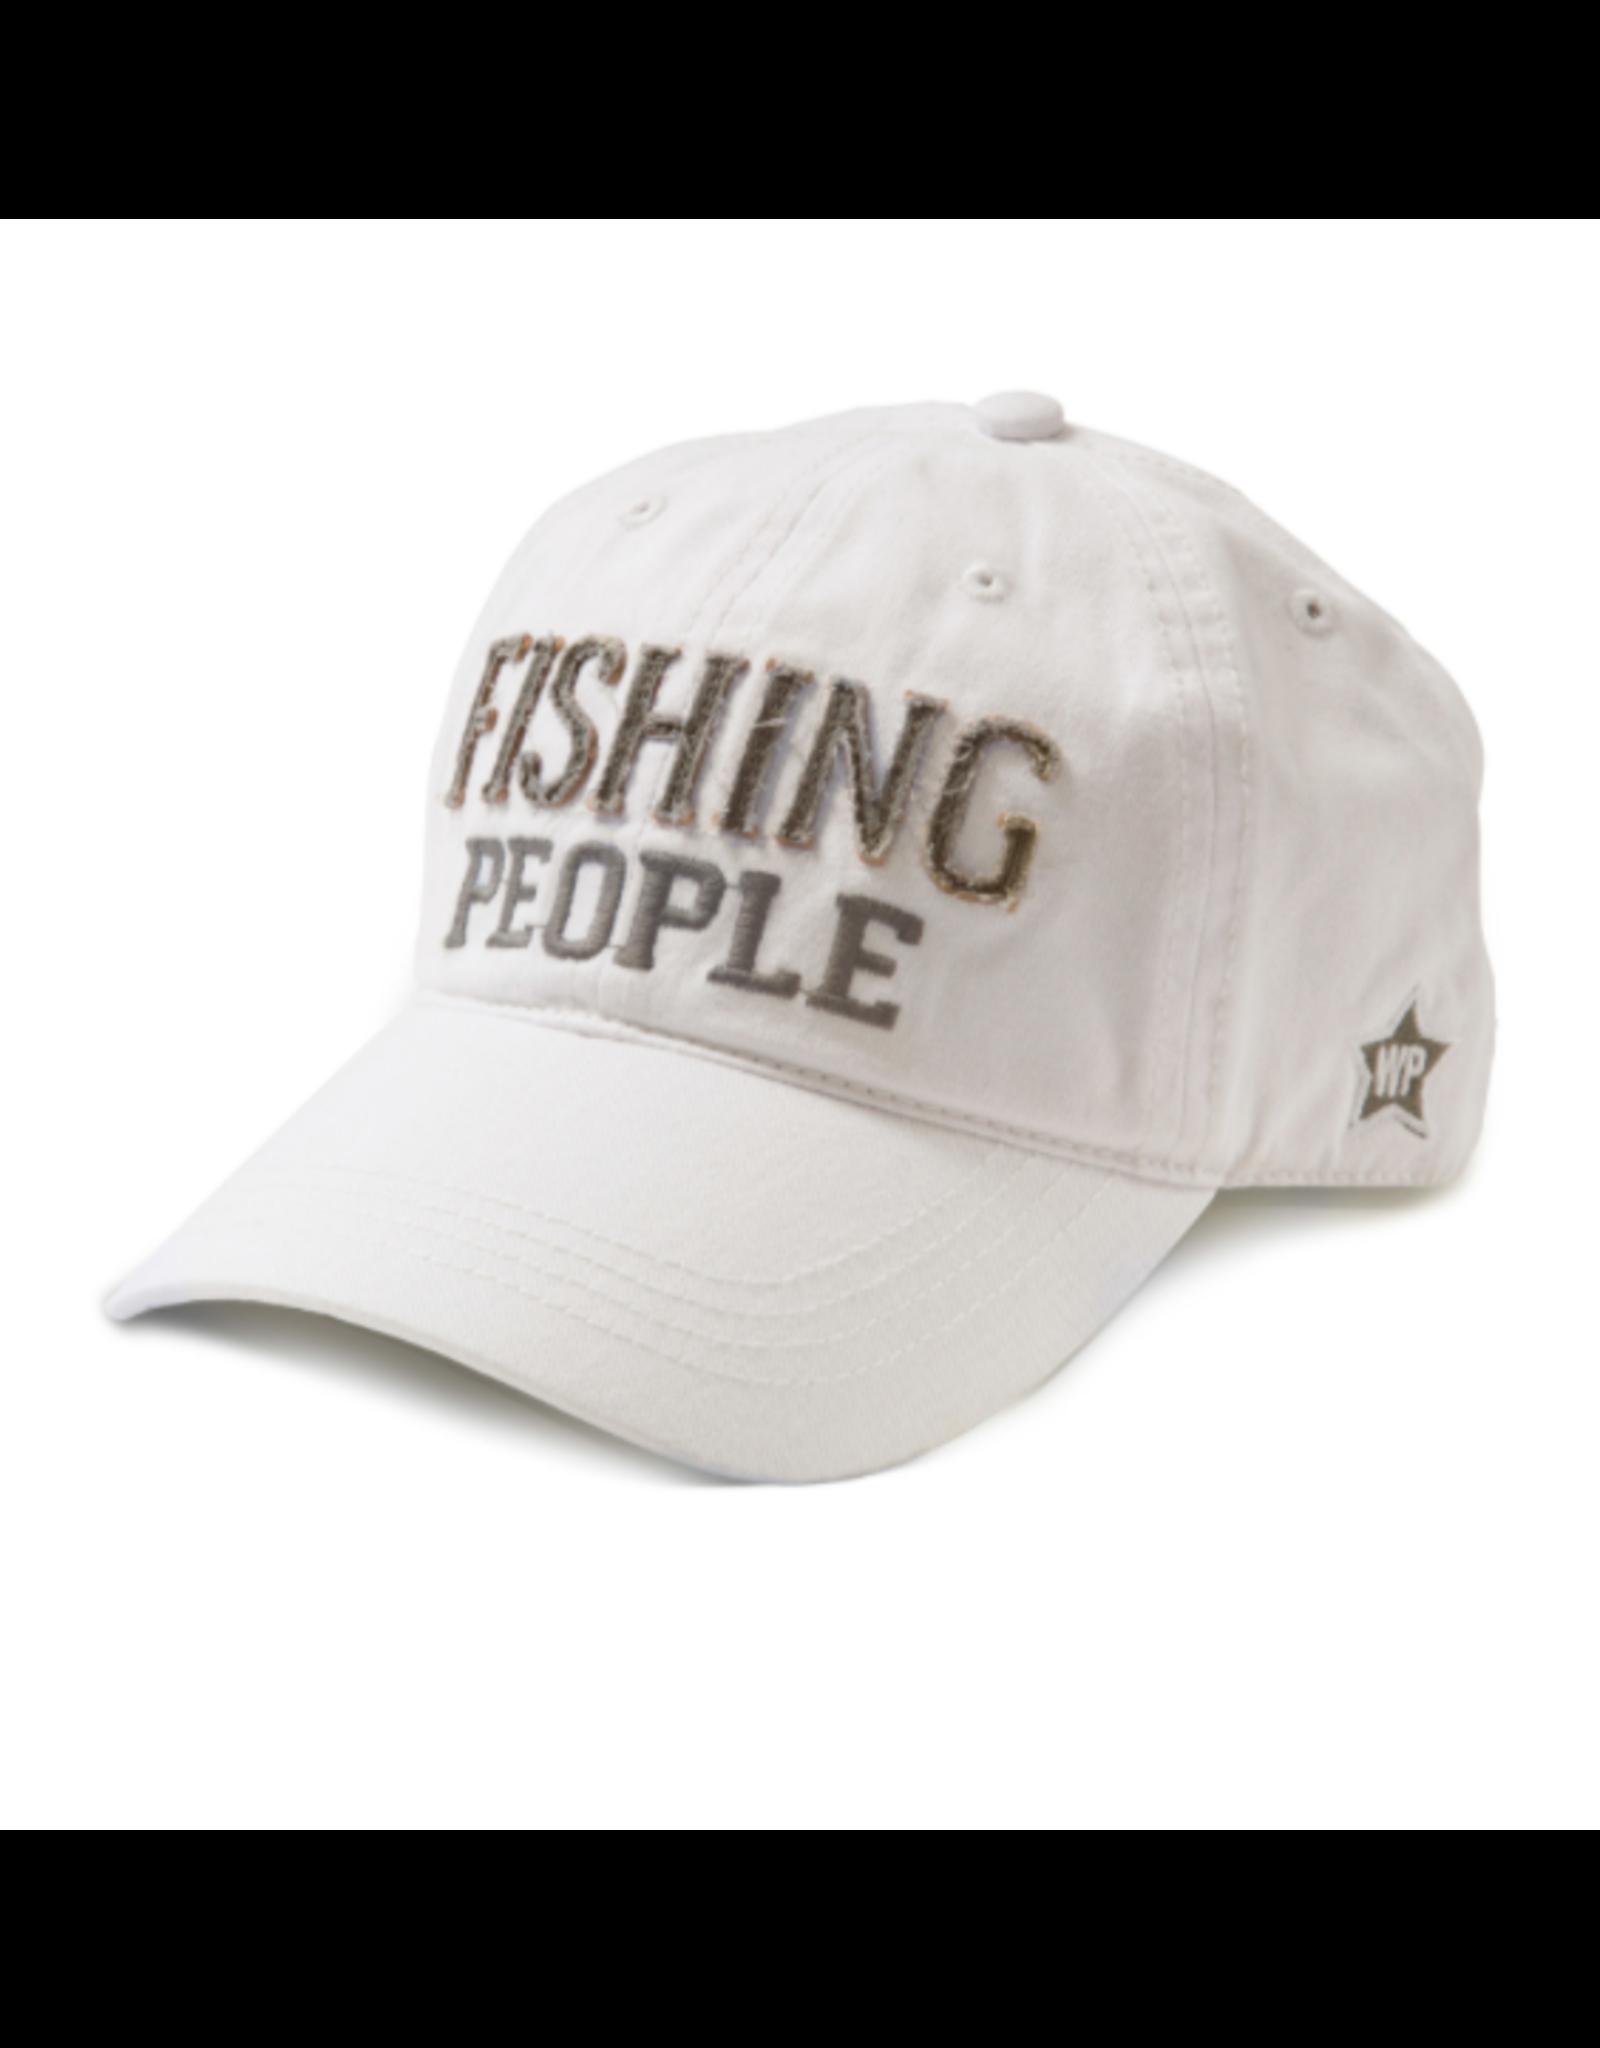 Fishing People Ball Hat, white